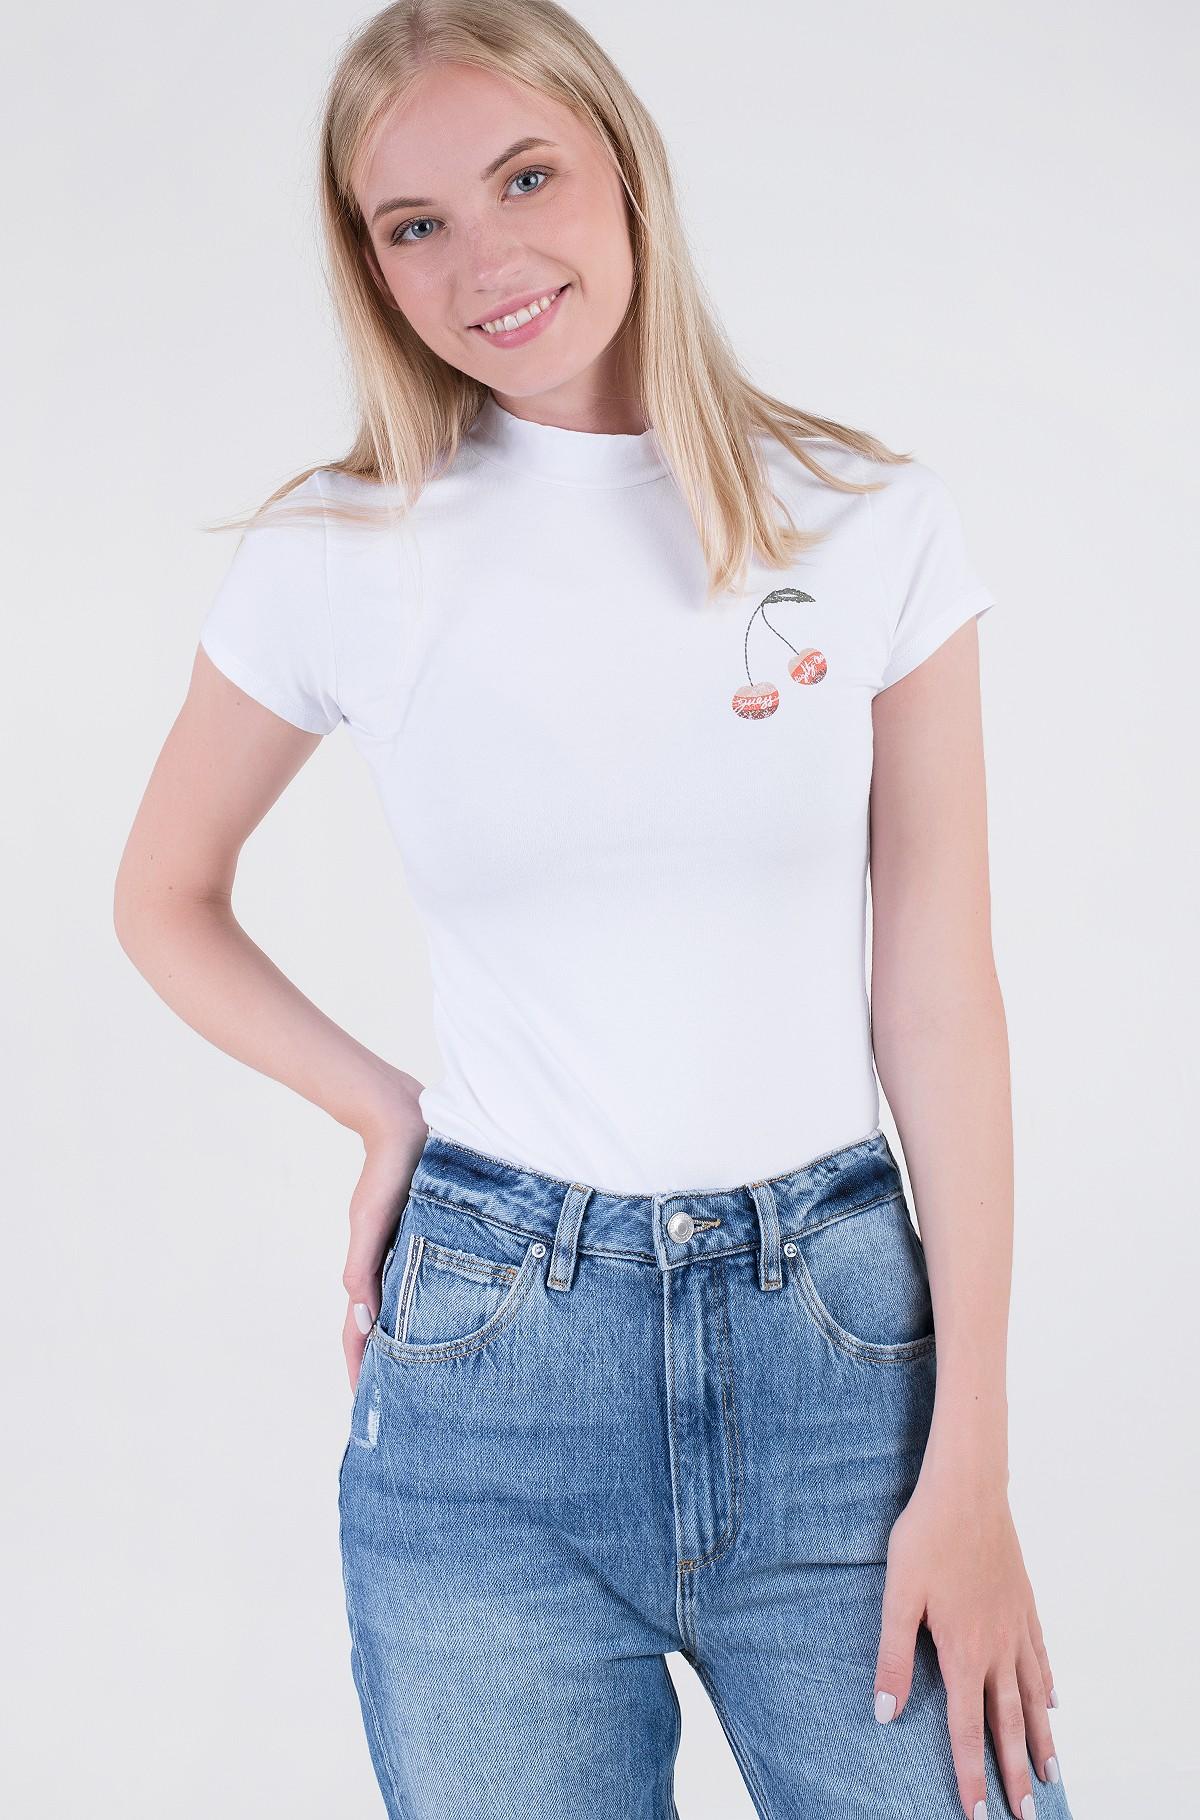 T-shirt W1YI38 RAKZ0-full-1